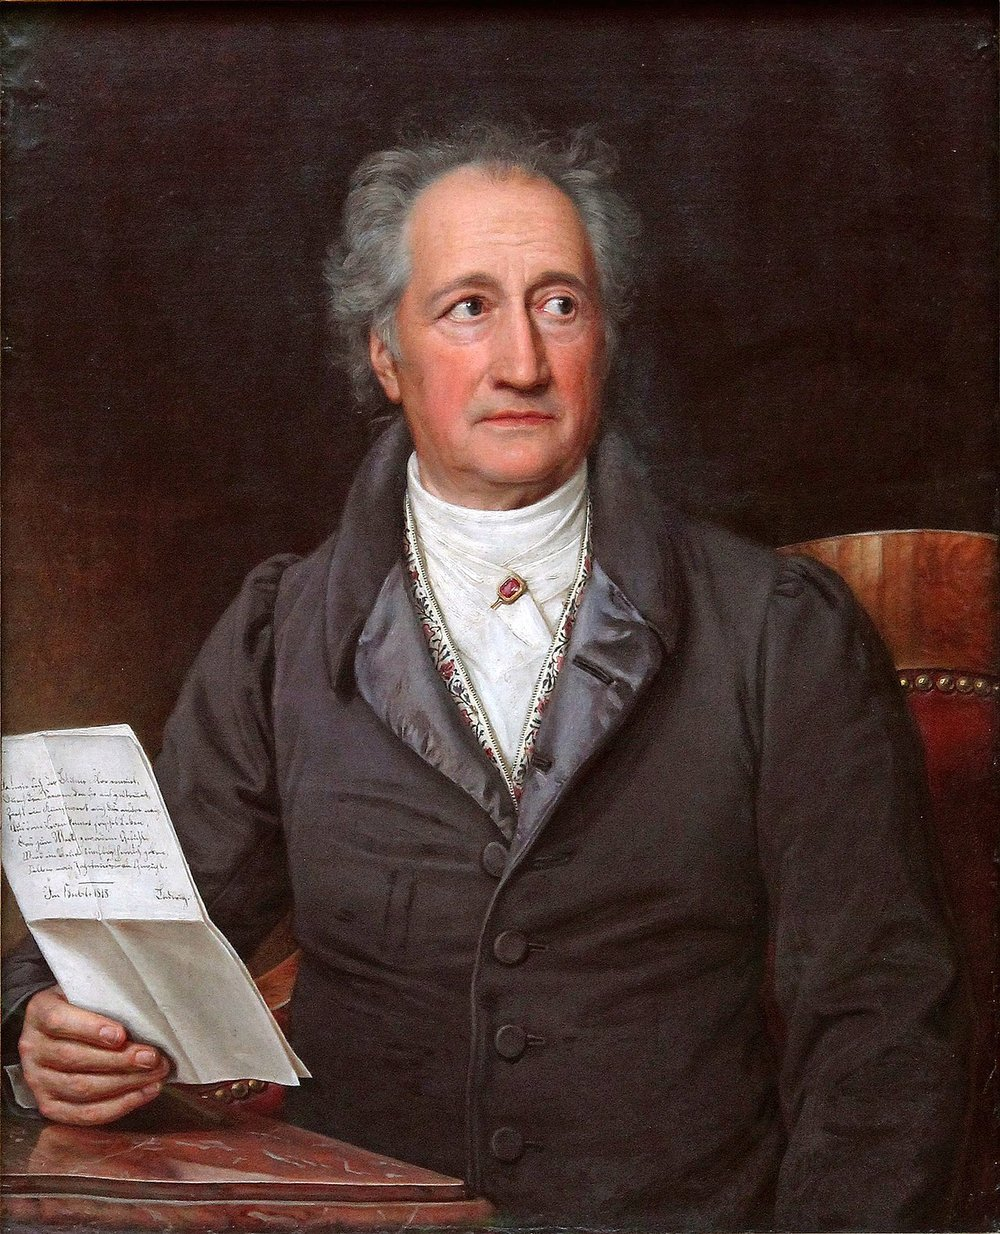 Johann Wolfgang von Goethe at age 79, painted by Joseph Karl Stieler (Neue Pinakothek/Wikimedia)